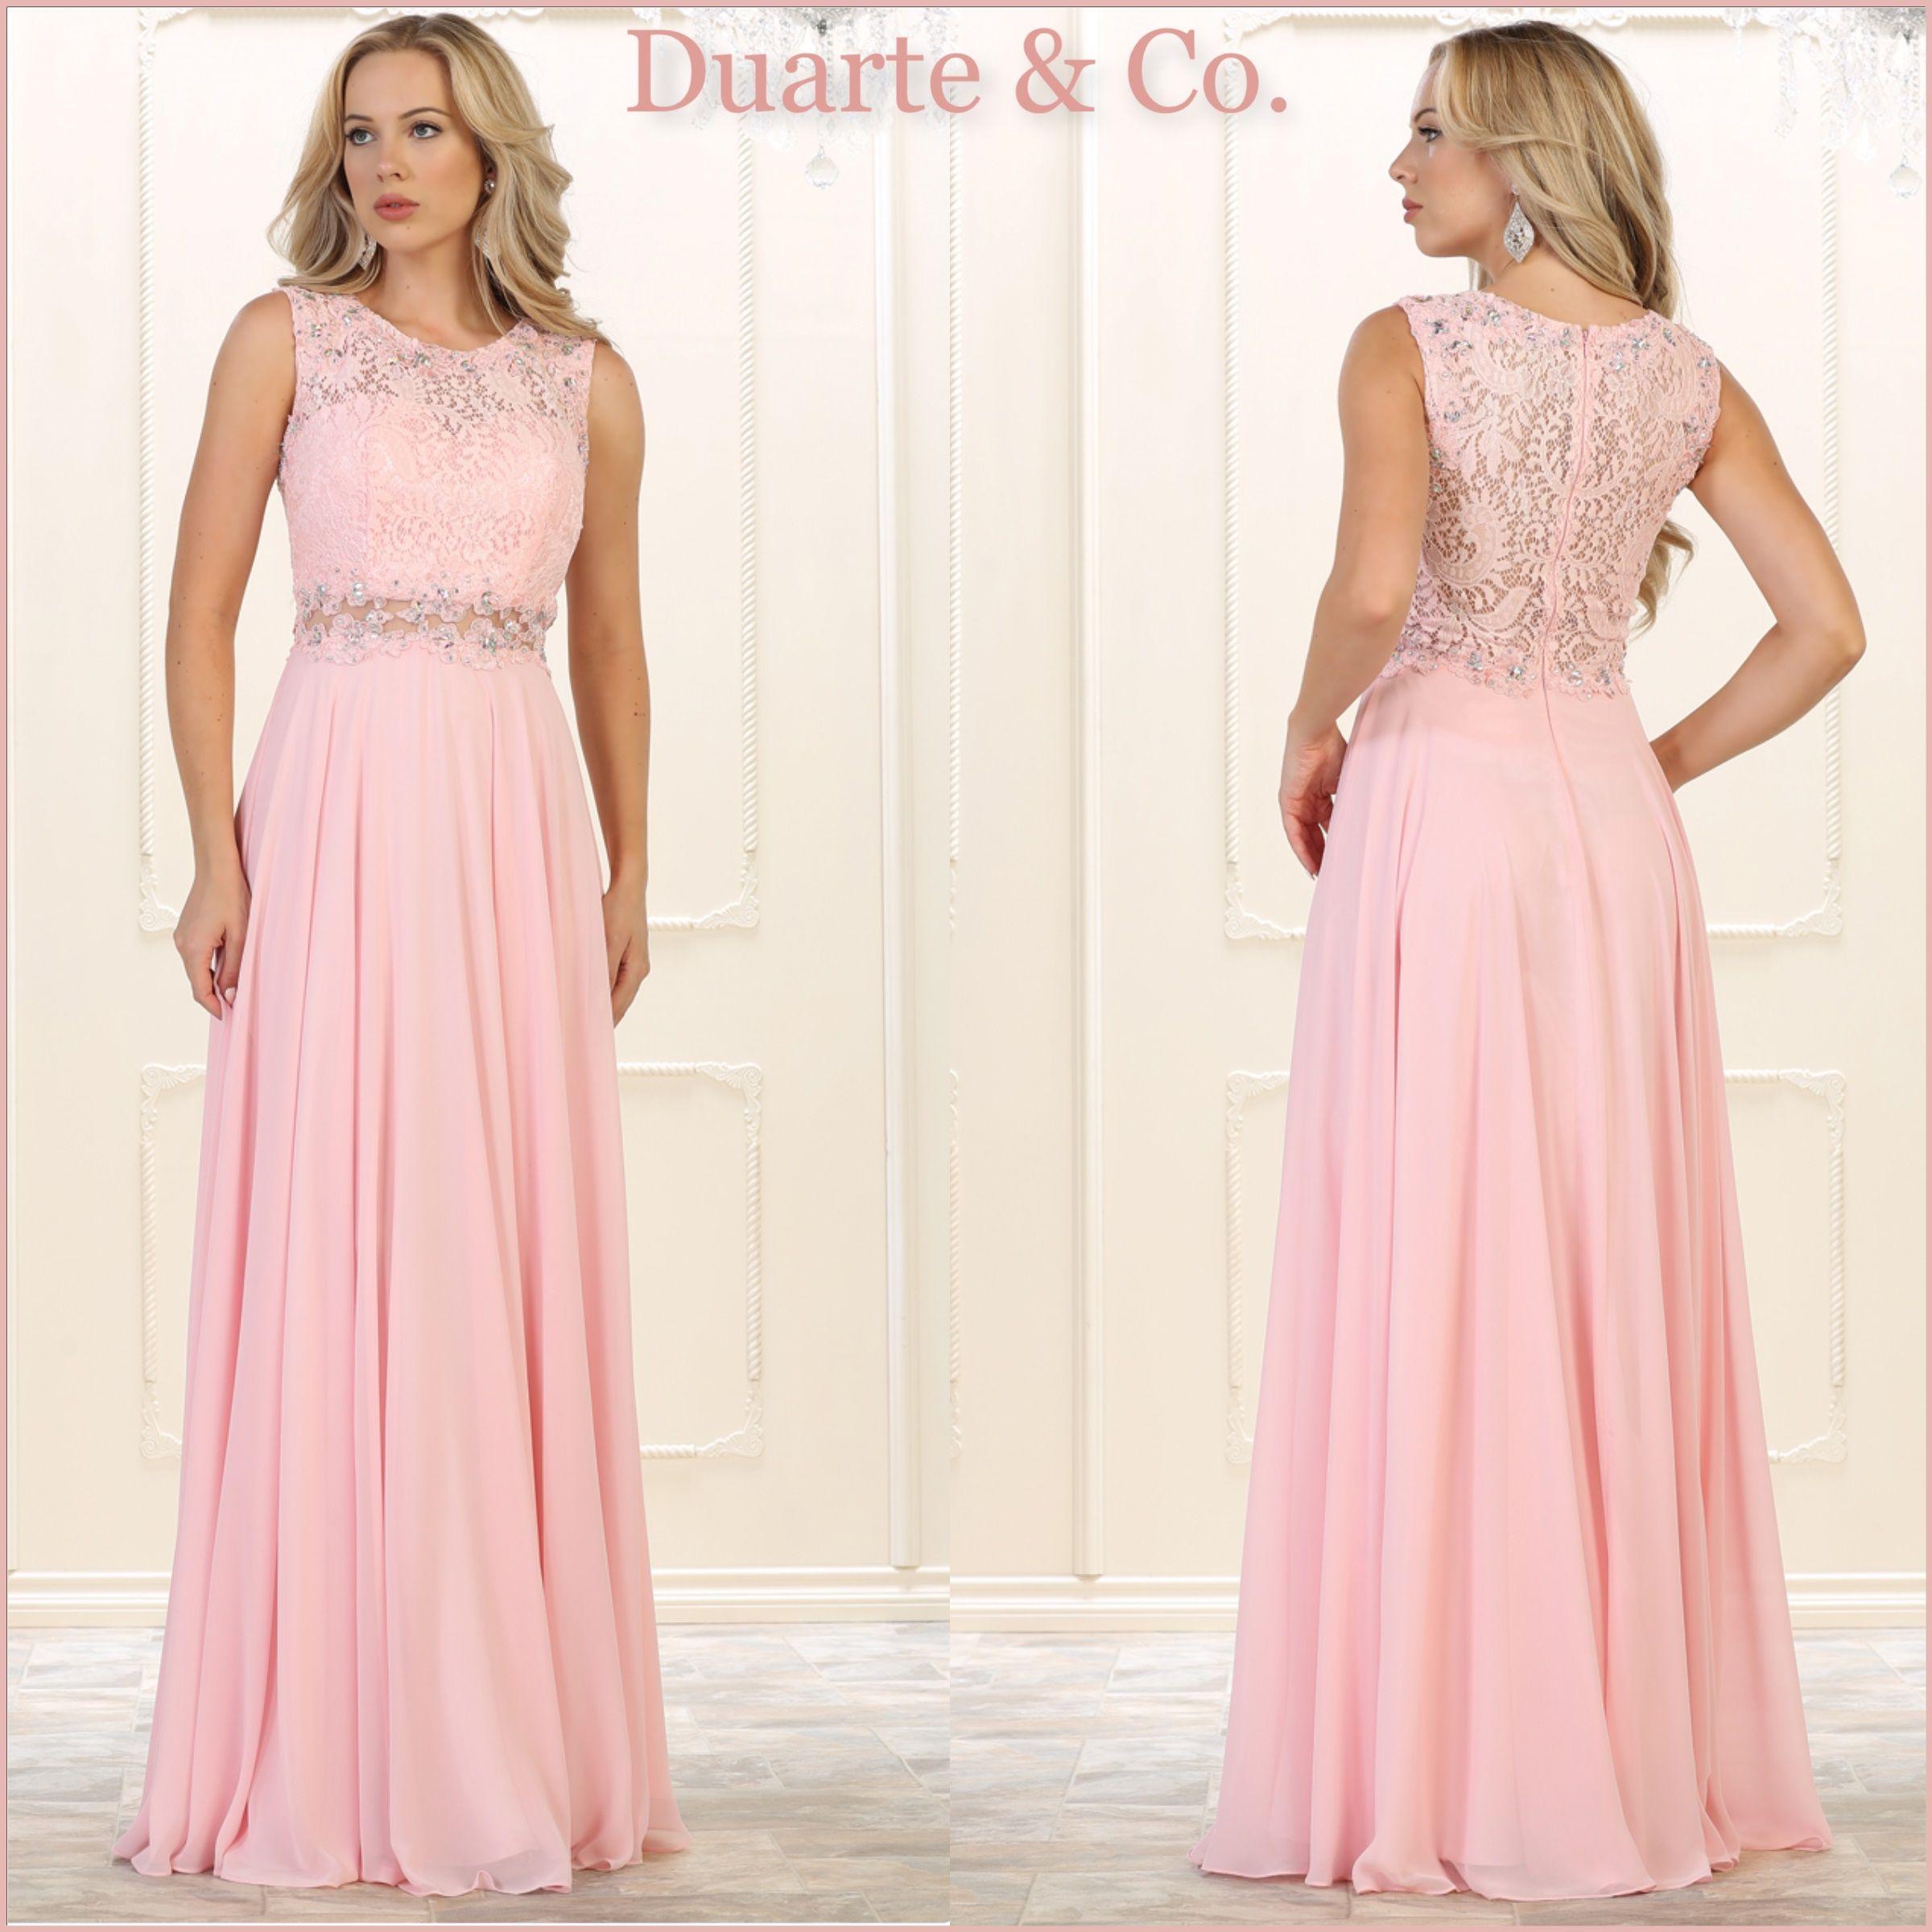 Long Chiffon Party Dress W/Plus Sizes - MQ1520   Prom party dresses ...